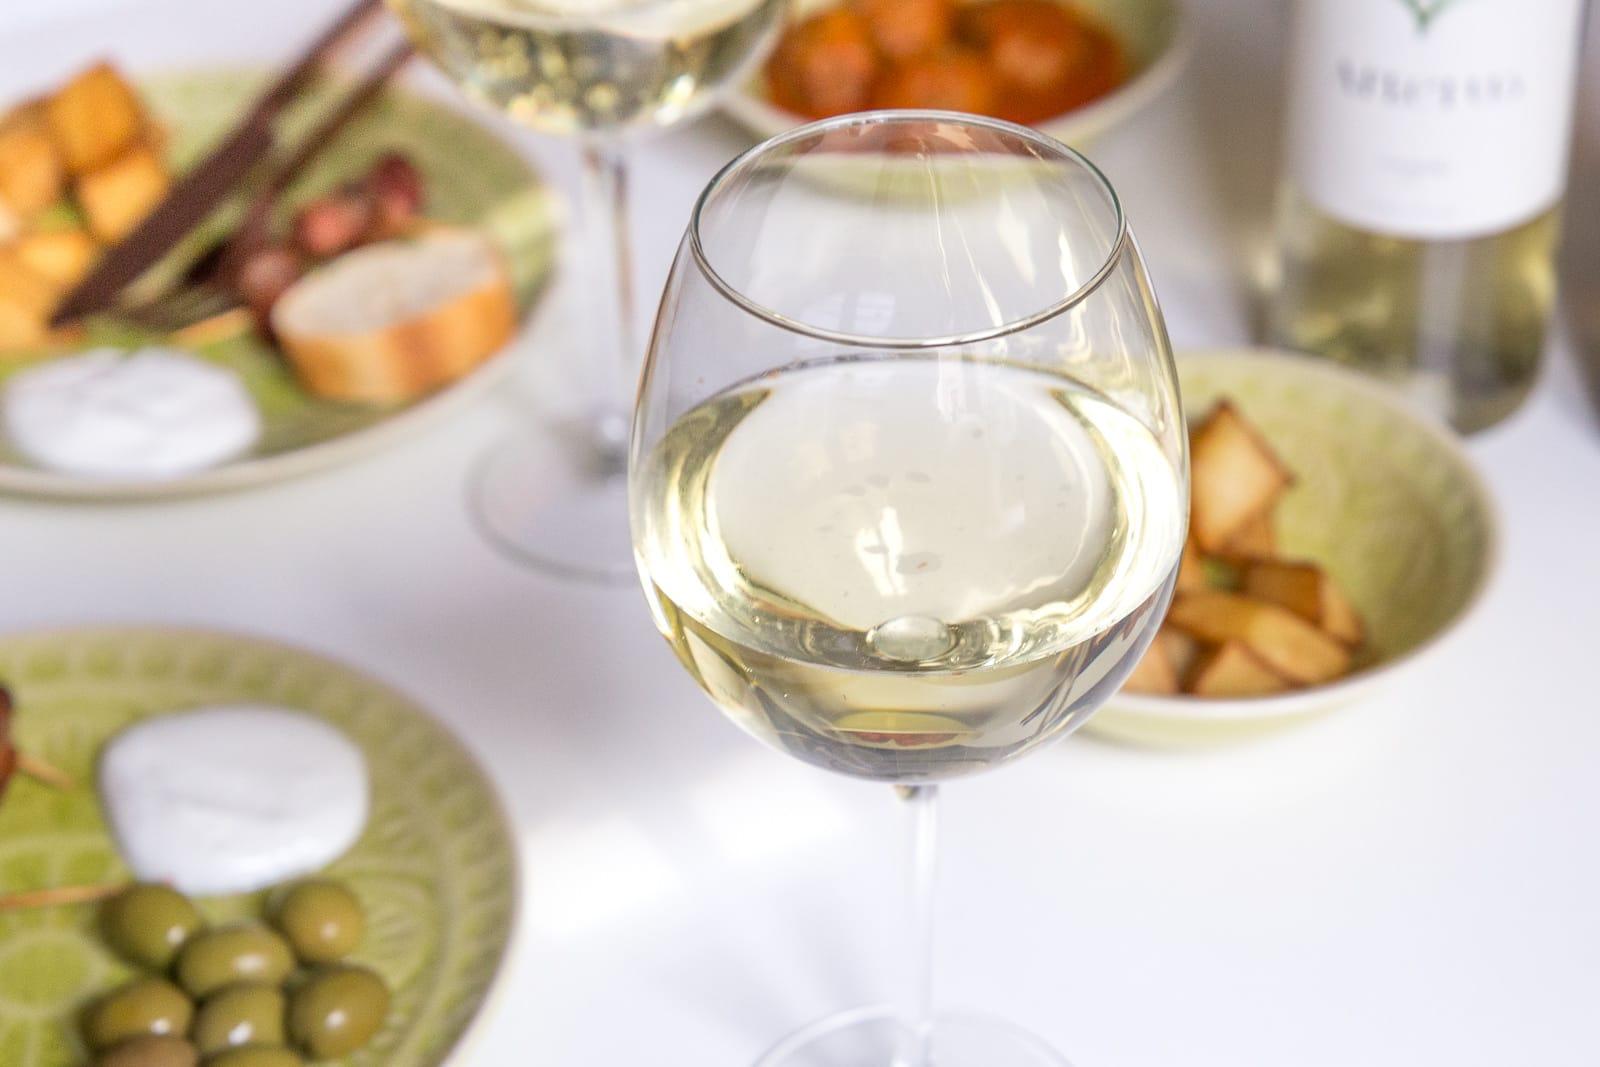 des-belles-choses-food-blog-rezepte-tapas-abend-in-den-eigenen-vier-waenden-vinho-verde-wein-portugal-geschmackstest-5.jpg